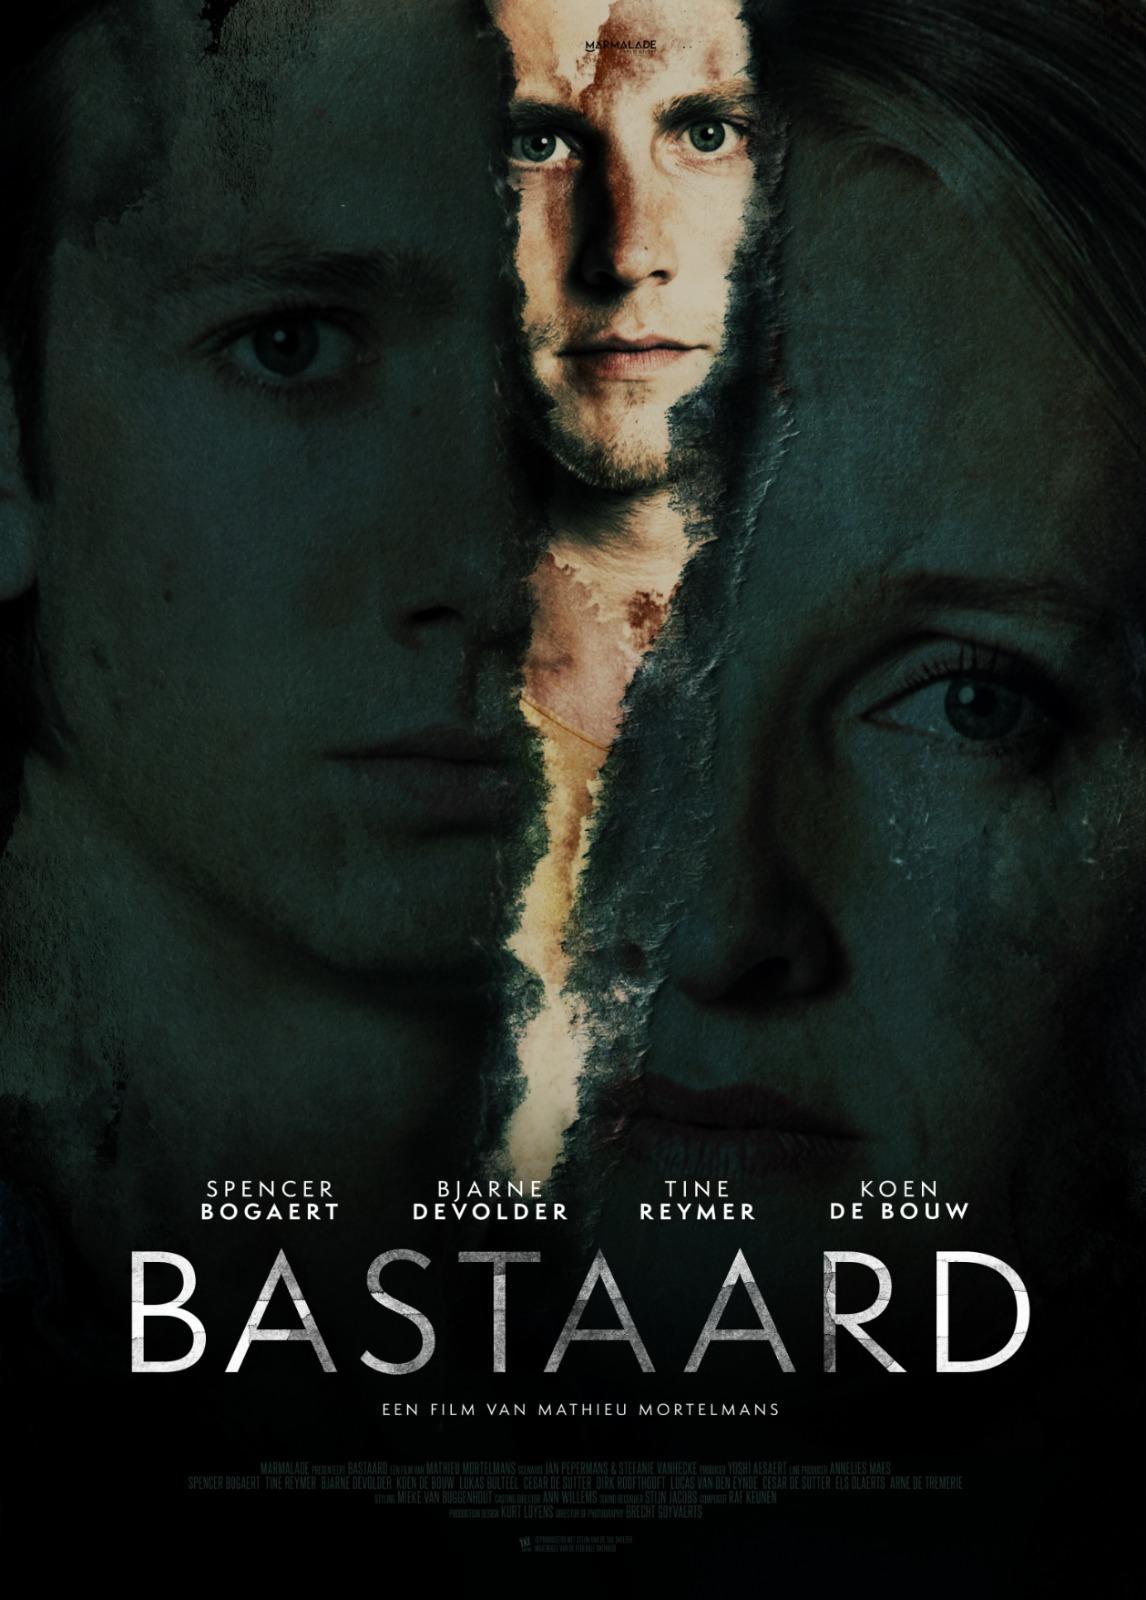 bjarne mädel movies and tv shows